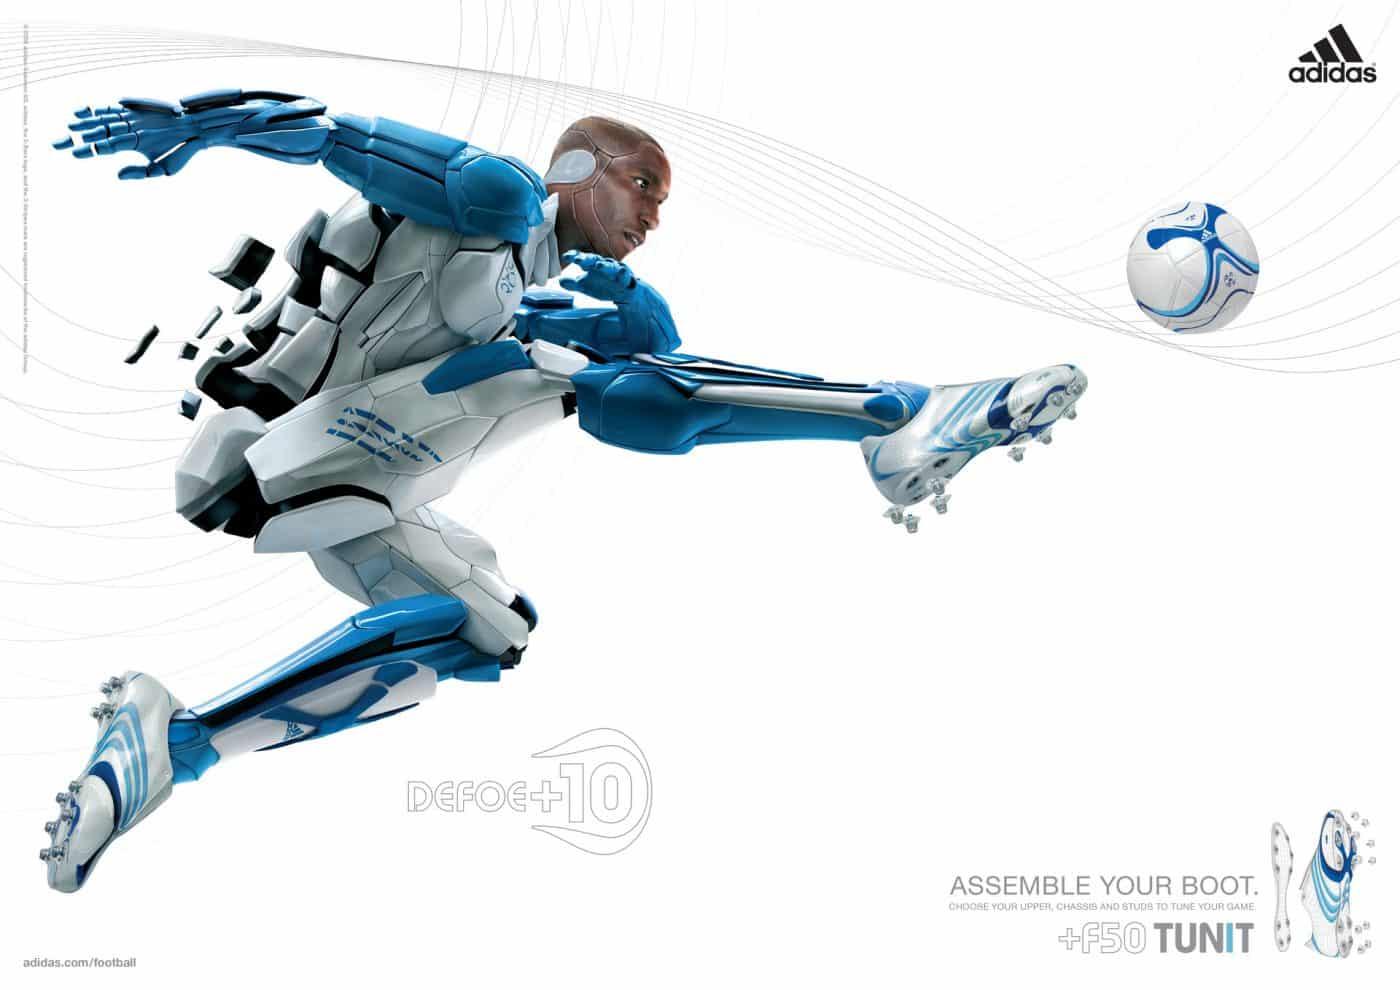 adidas-F50-tunit-jermaine-defoe